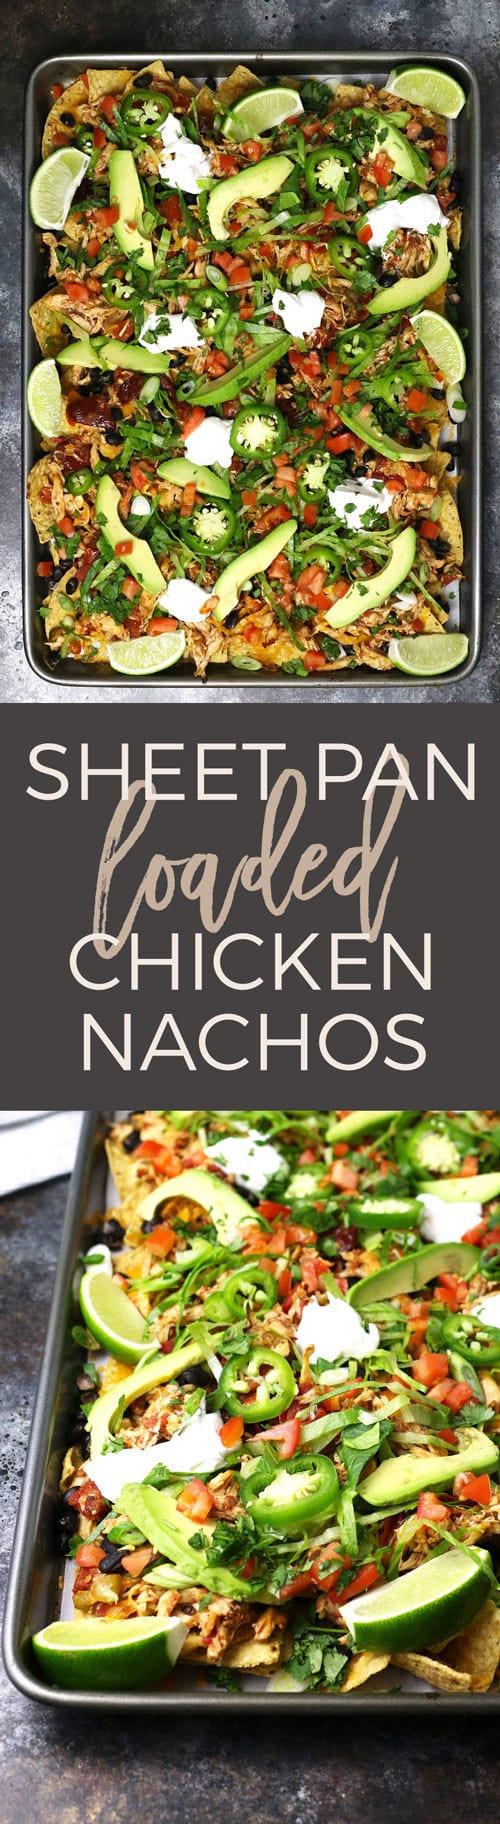 sheet pan loaded chicken nachos pinterest image